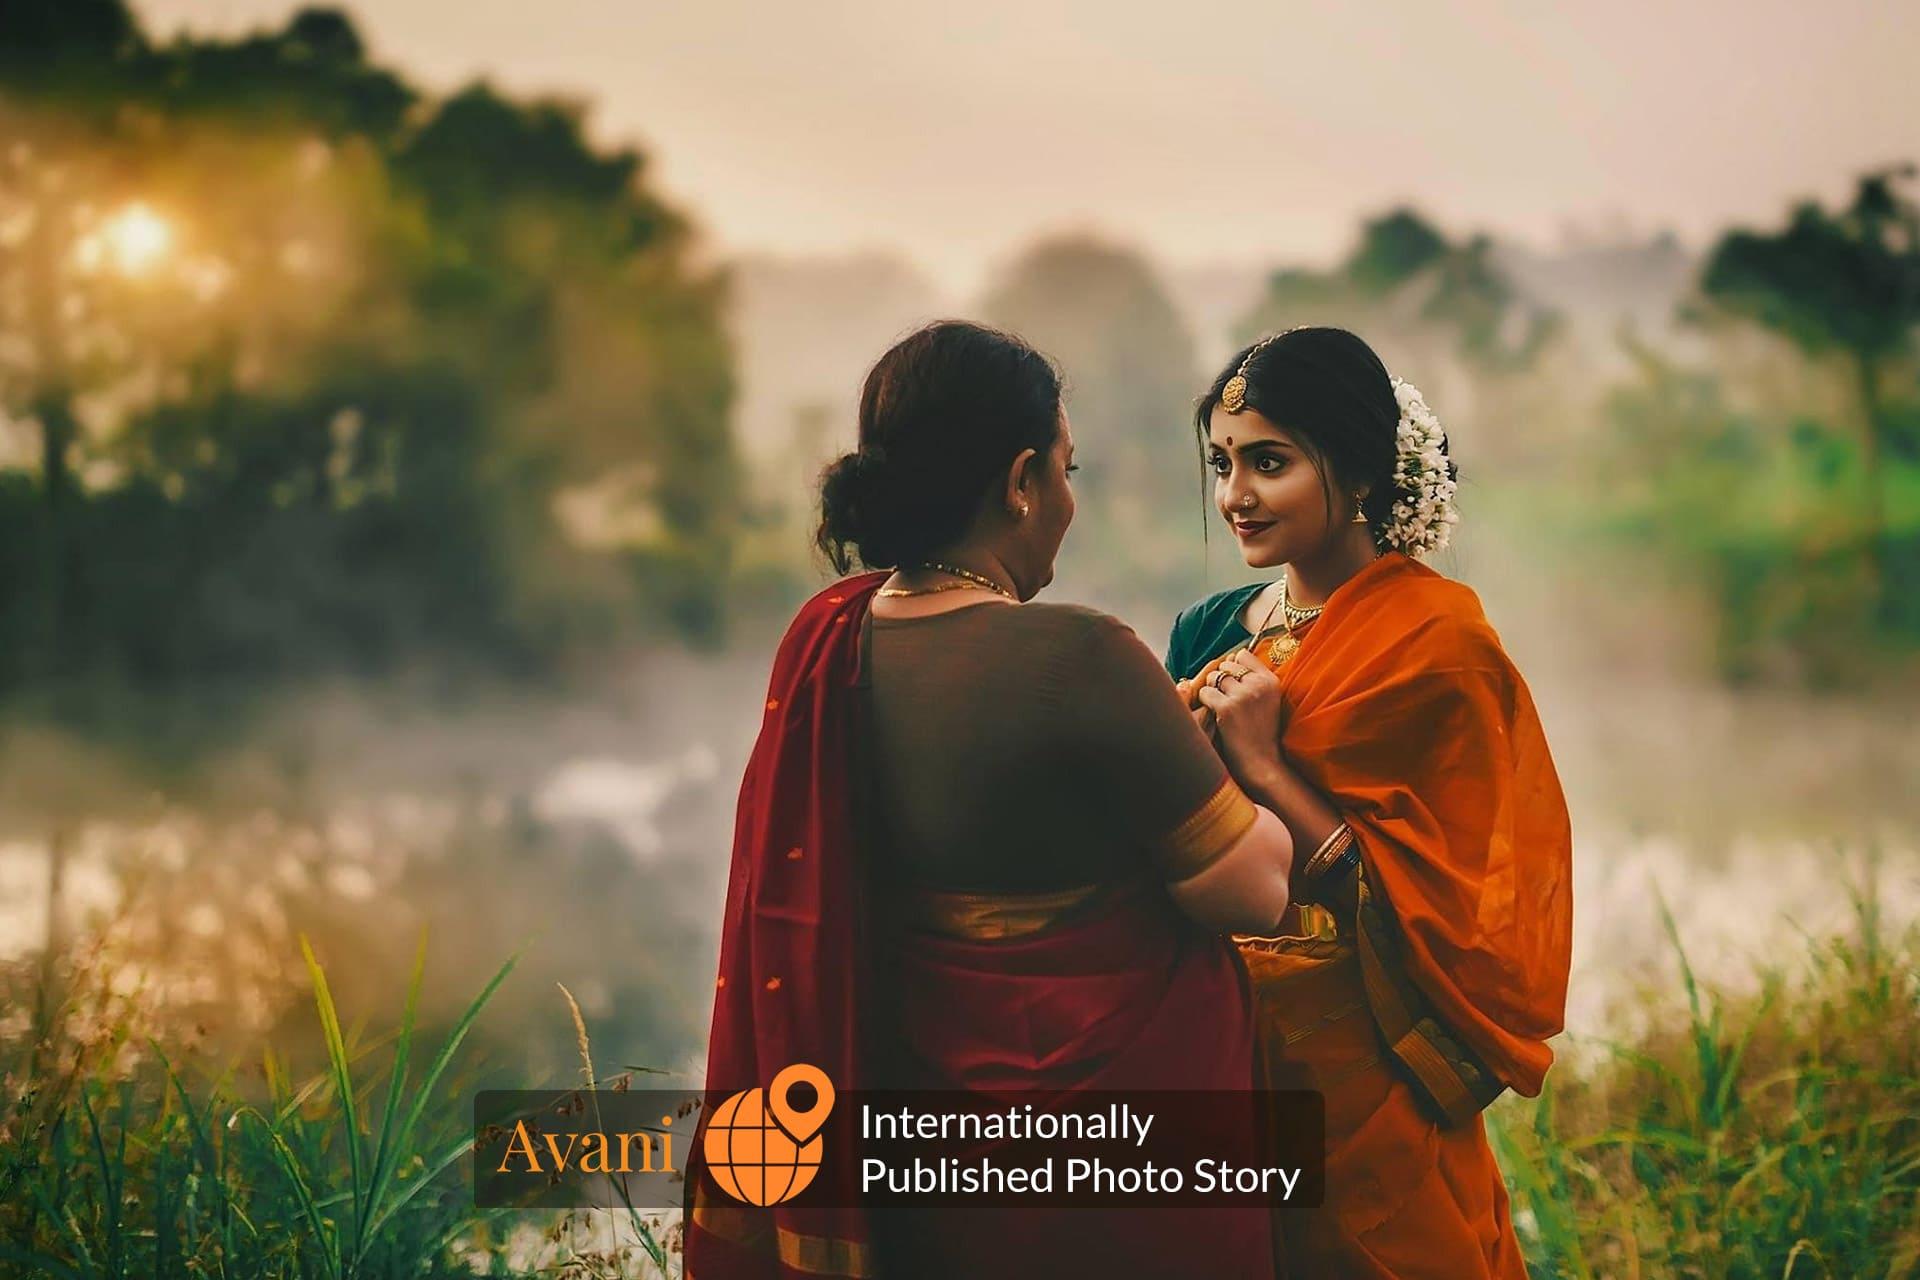 Avani an internationally acclaimed photo story by Arjun Kamath